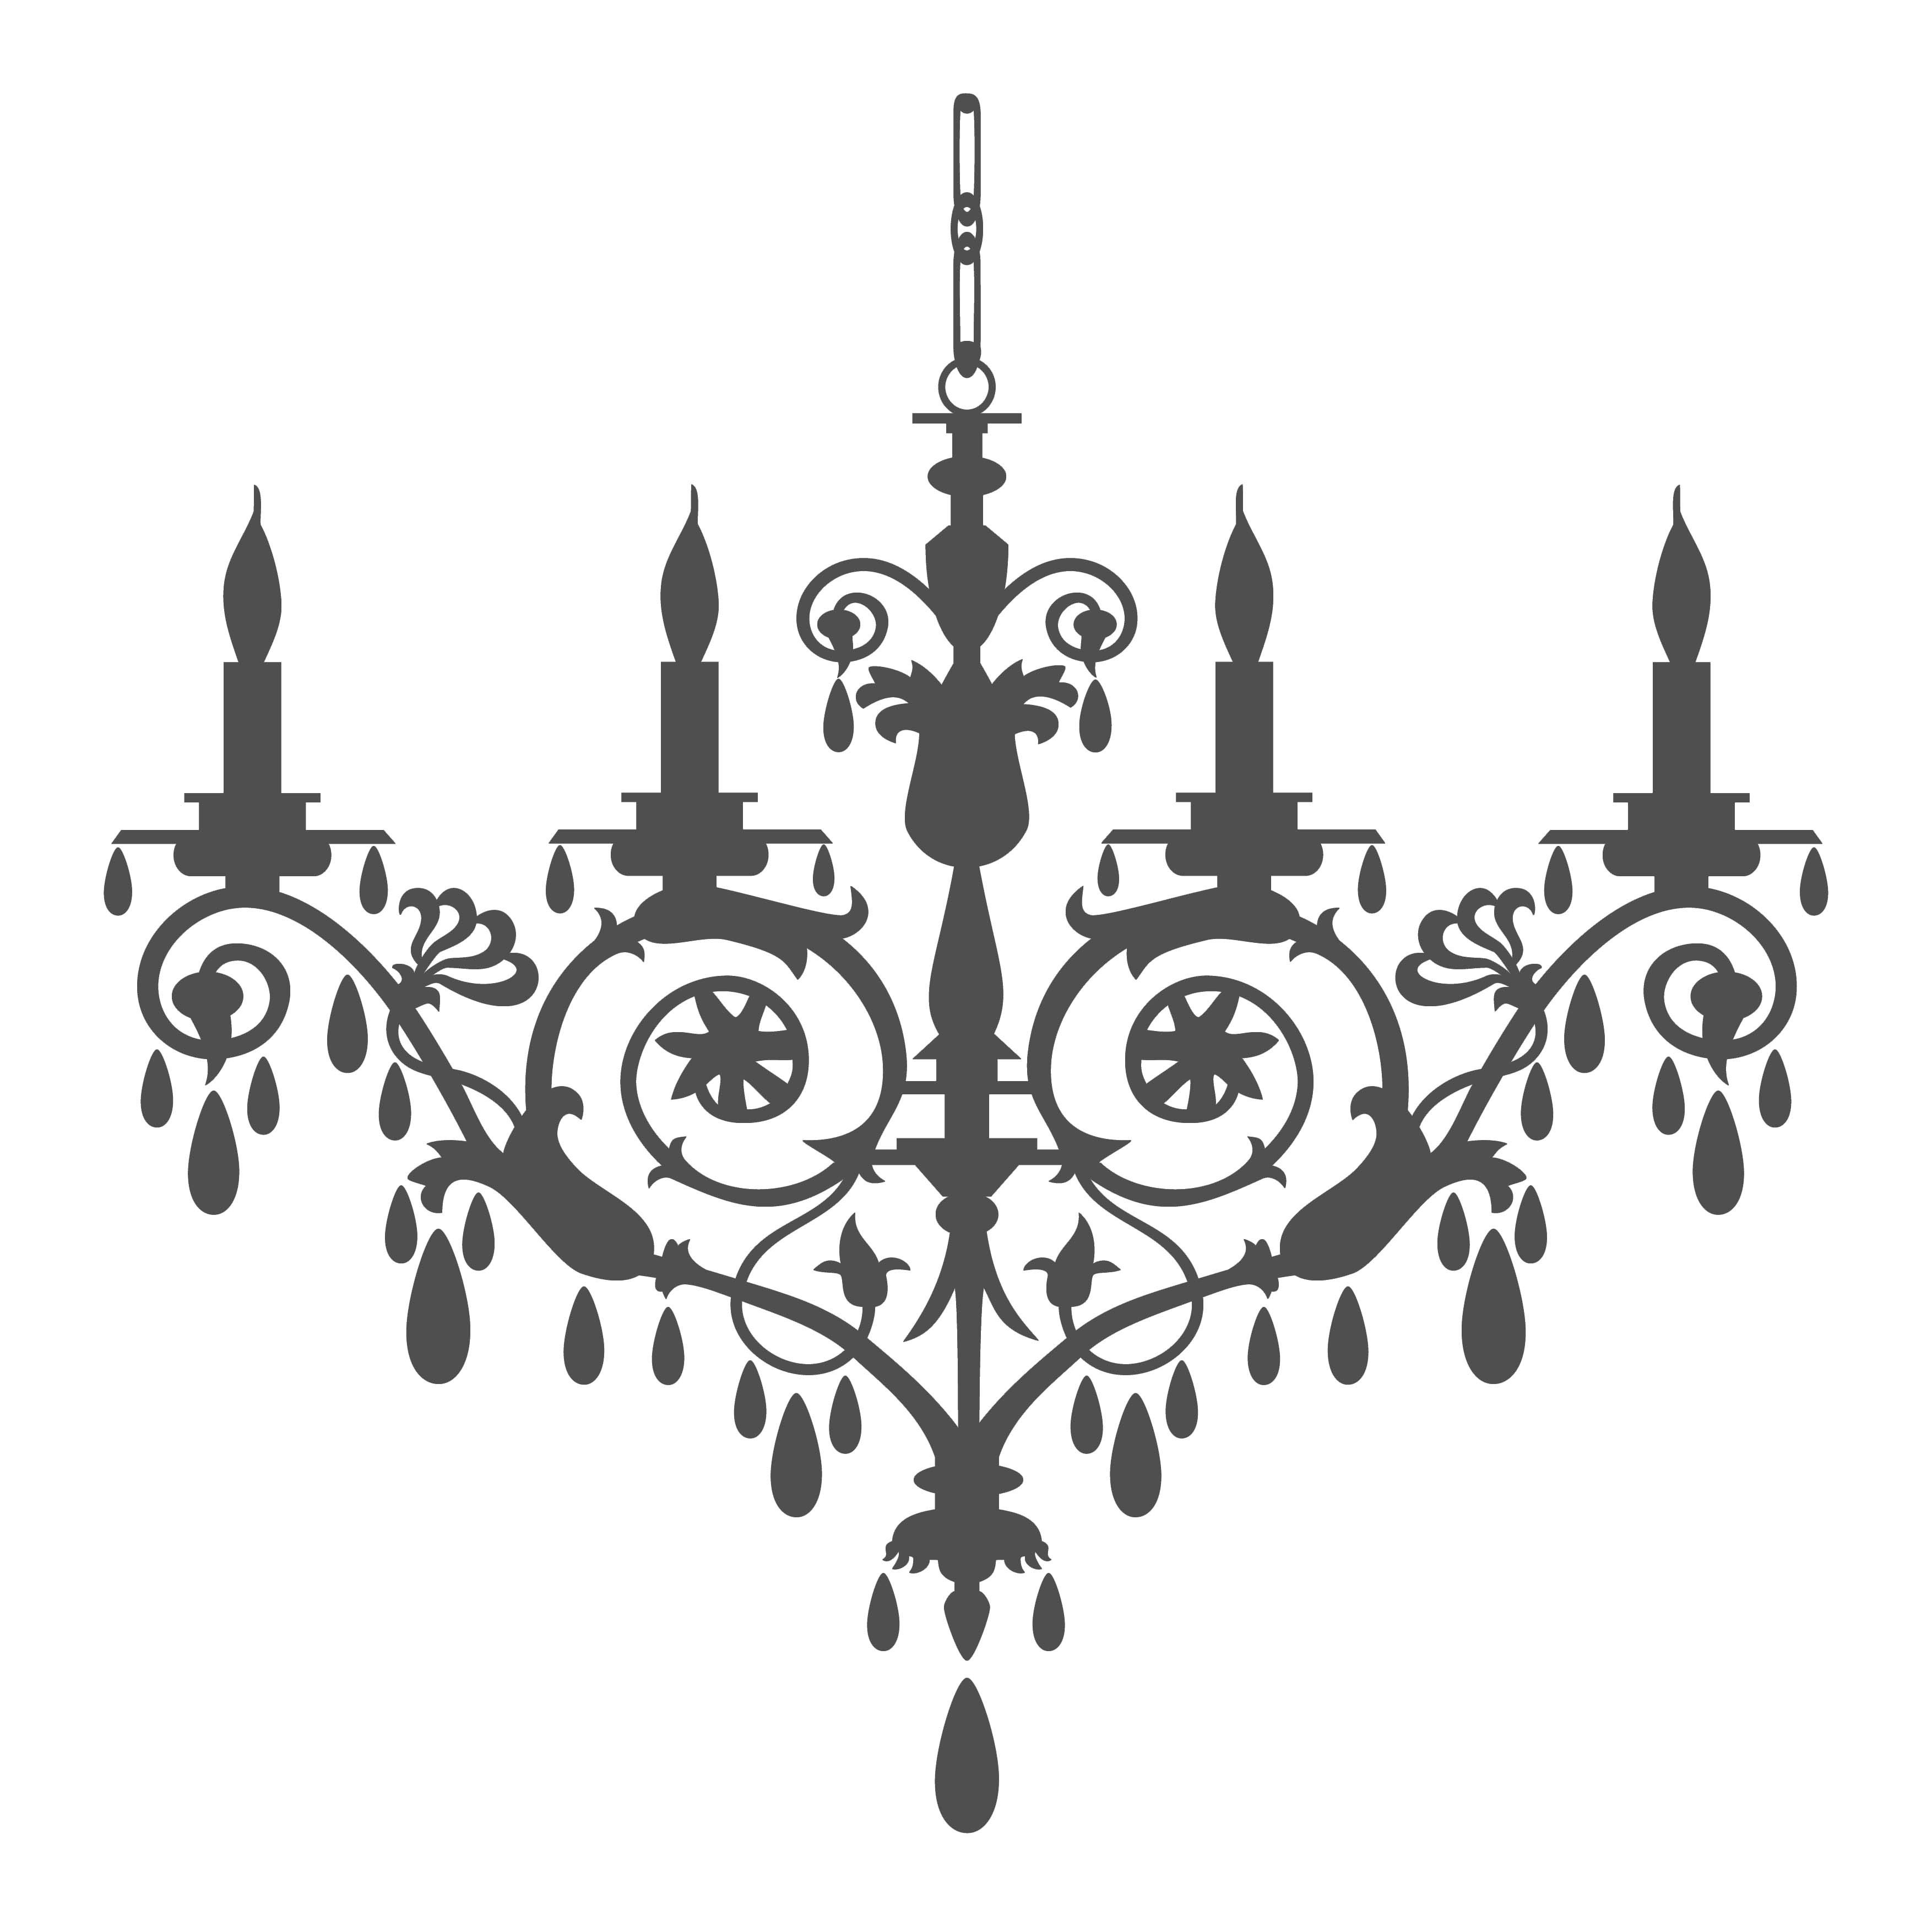 Kroonluchter 2 formaten 22 kleuren kleinfijn op canvas retro chandelier silhouette by ela kwasniewski via dreamstime mozeypictures Images